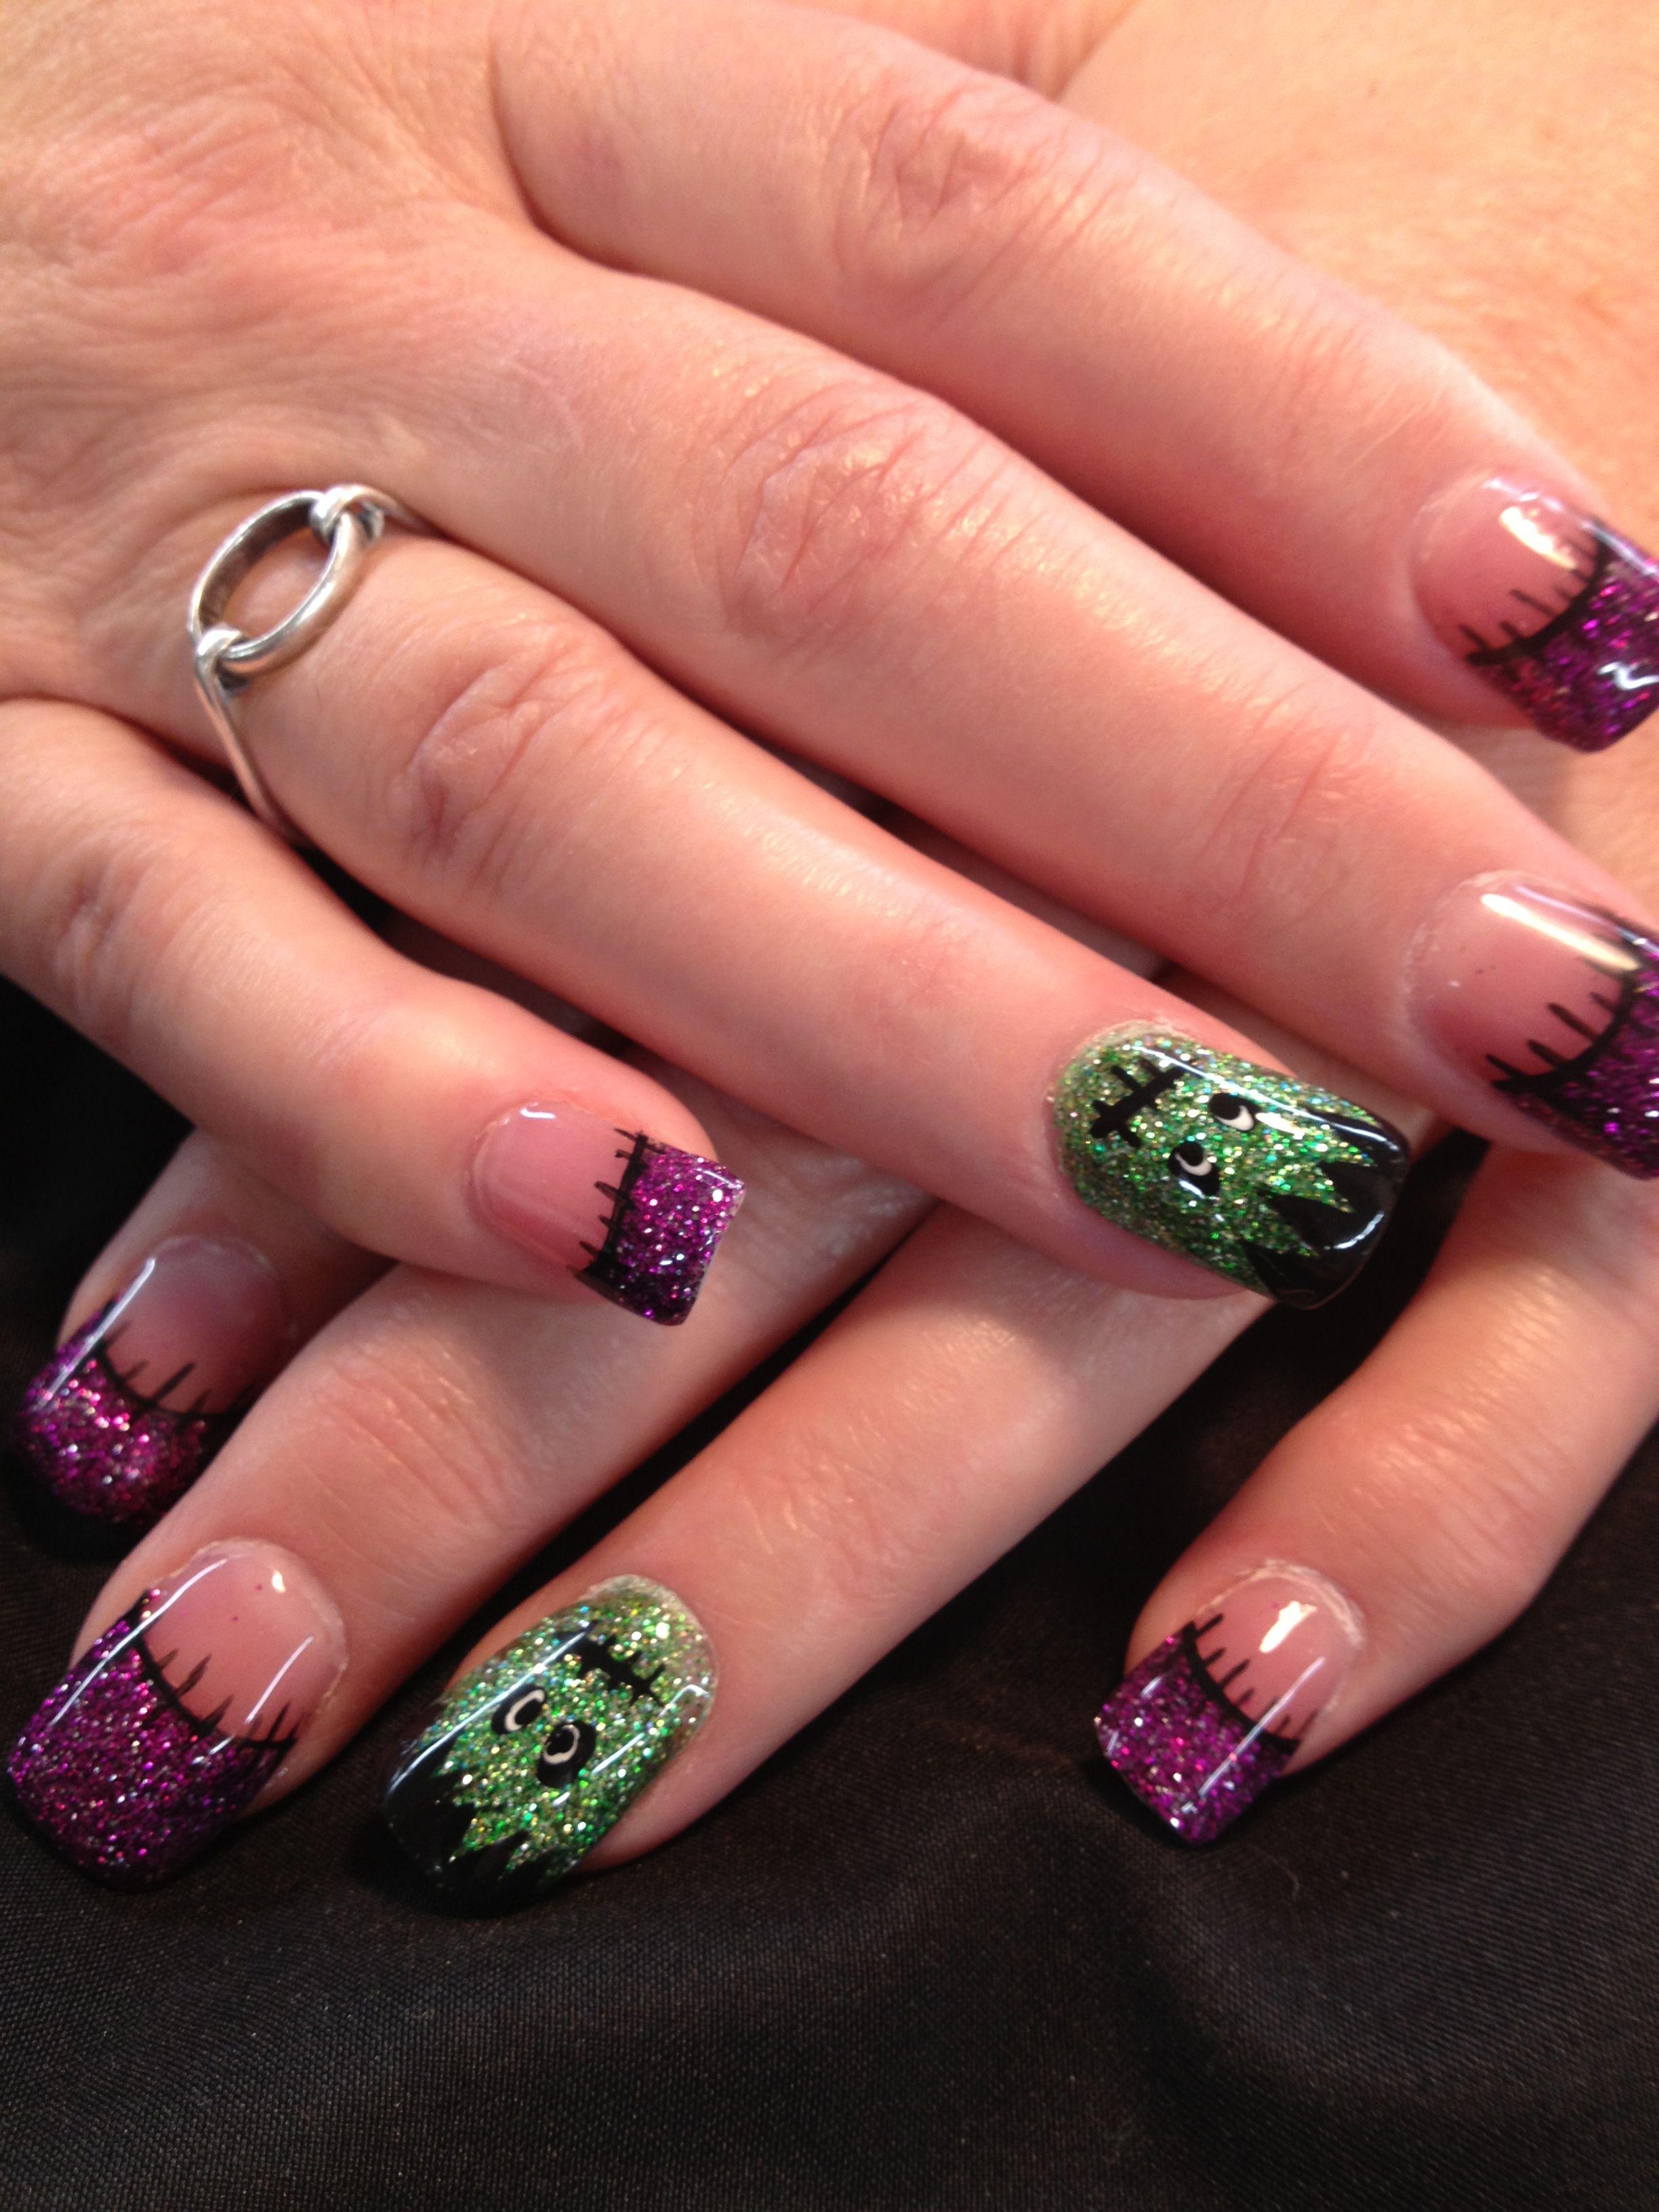 Halloween nail art | Nail art, Halloween nail art, Classy ...